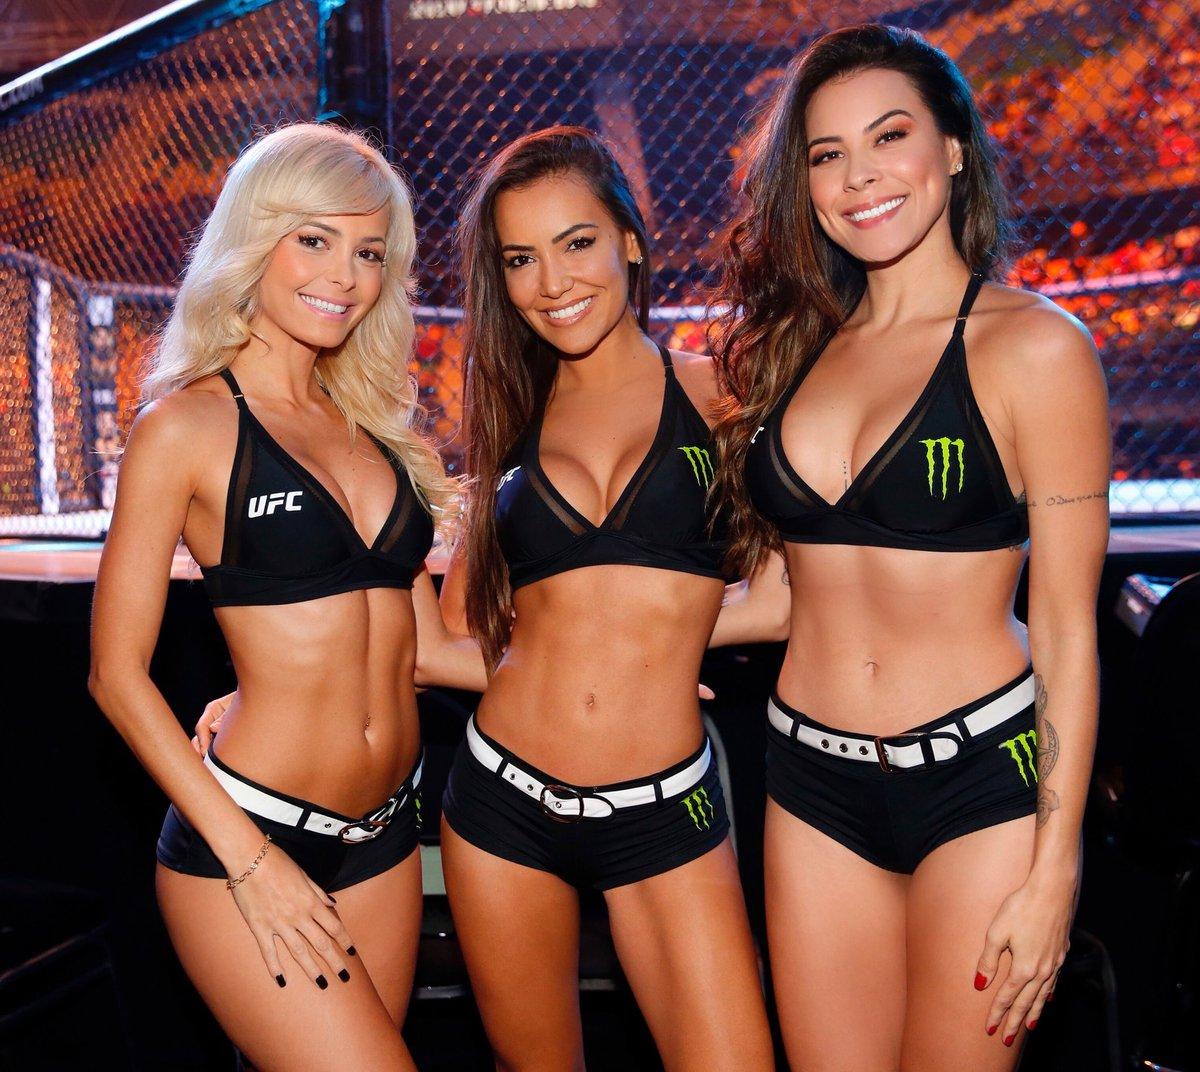 What a trio 😍 @JhennyUFC   @LucianaAndrade   @CamisOliveira_ #UFCArgentina